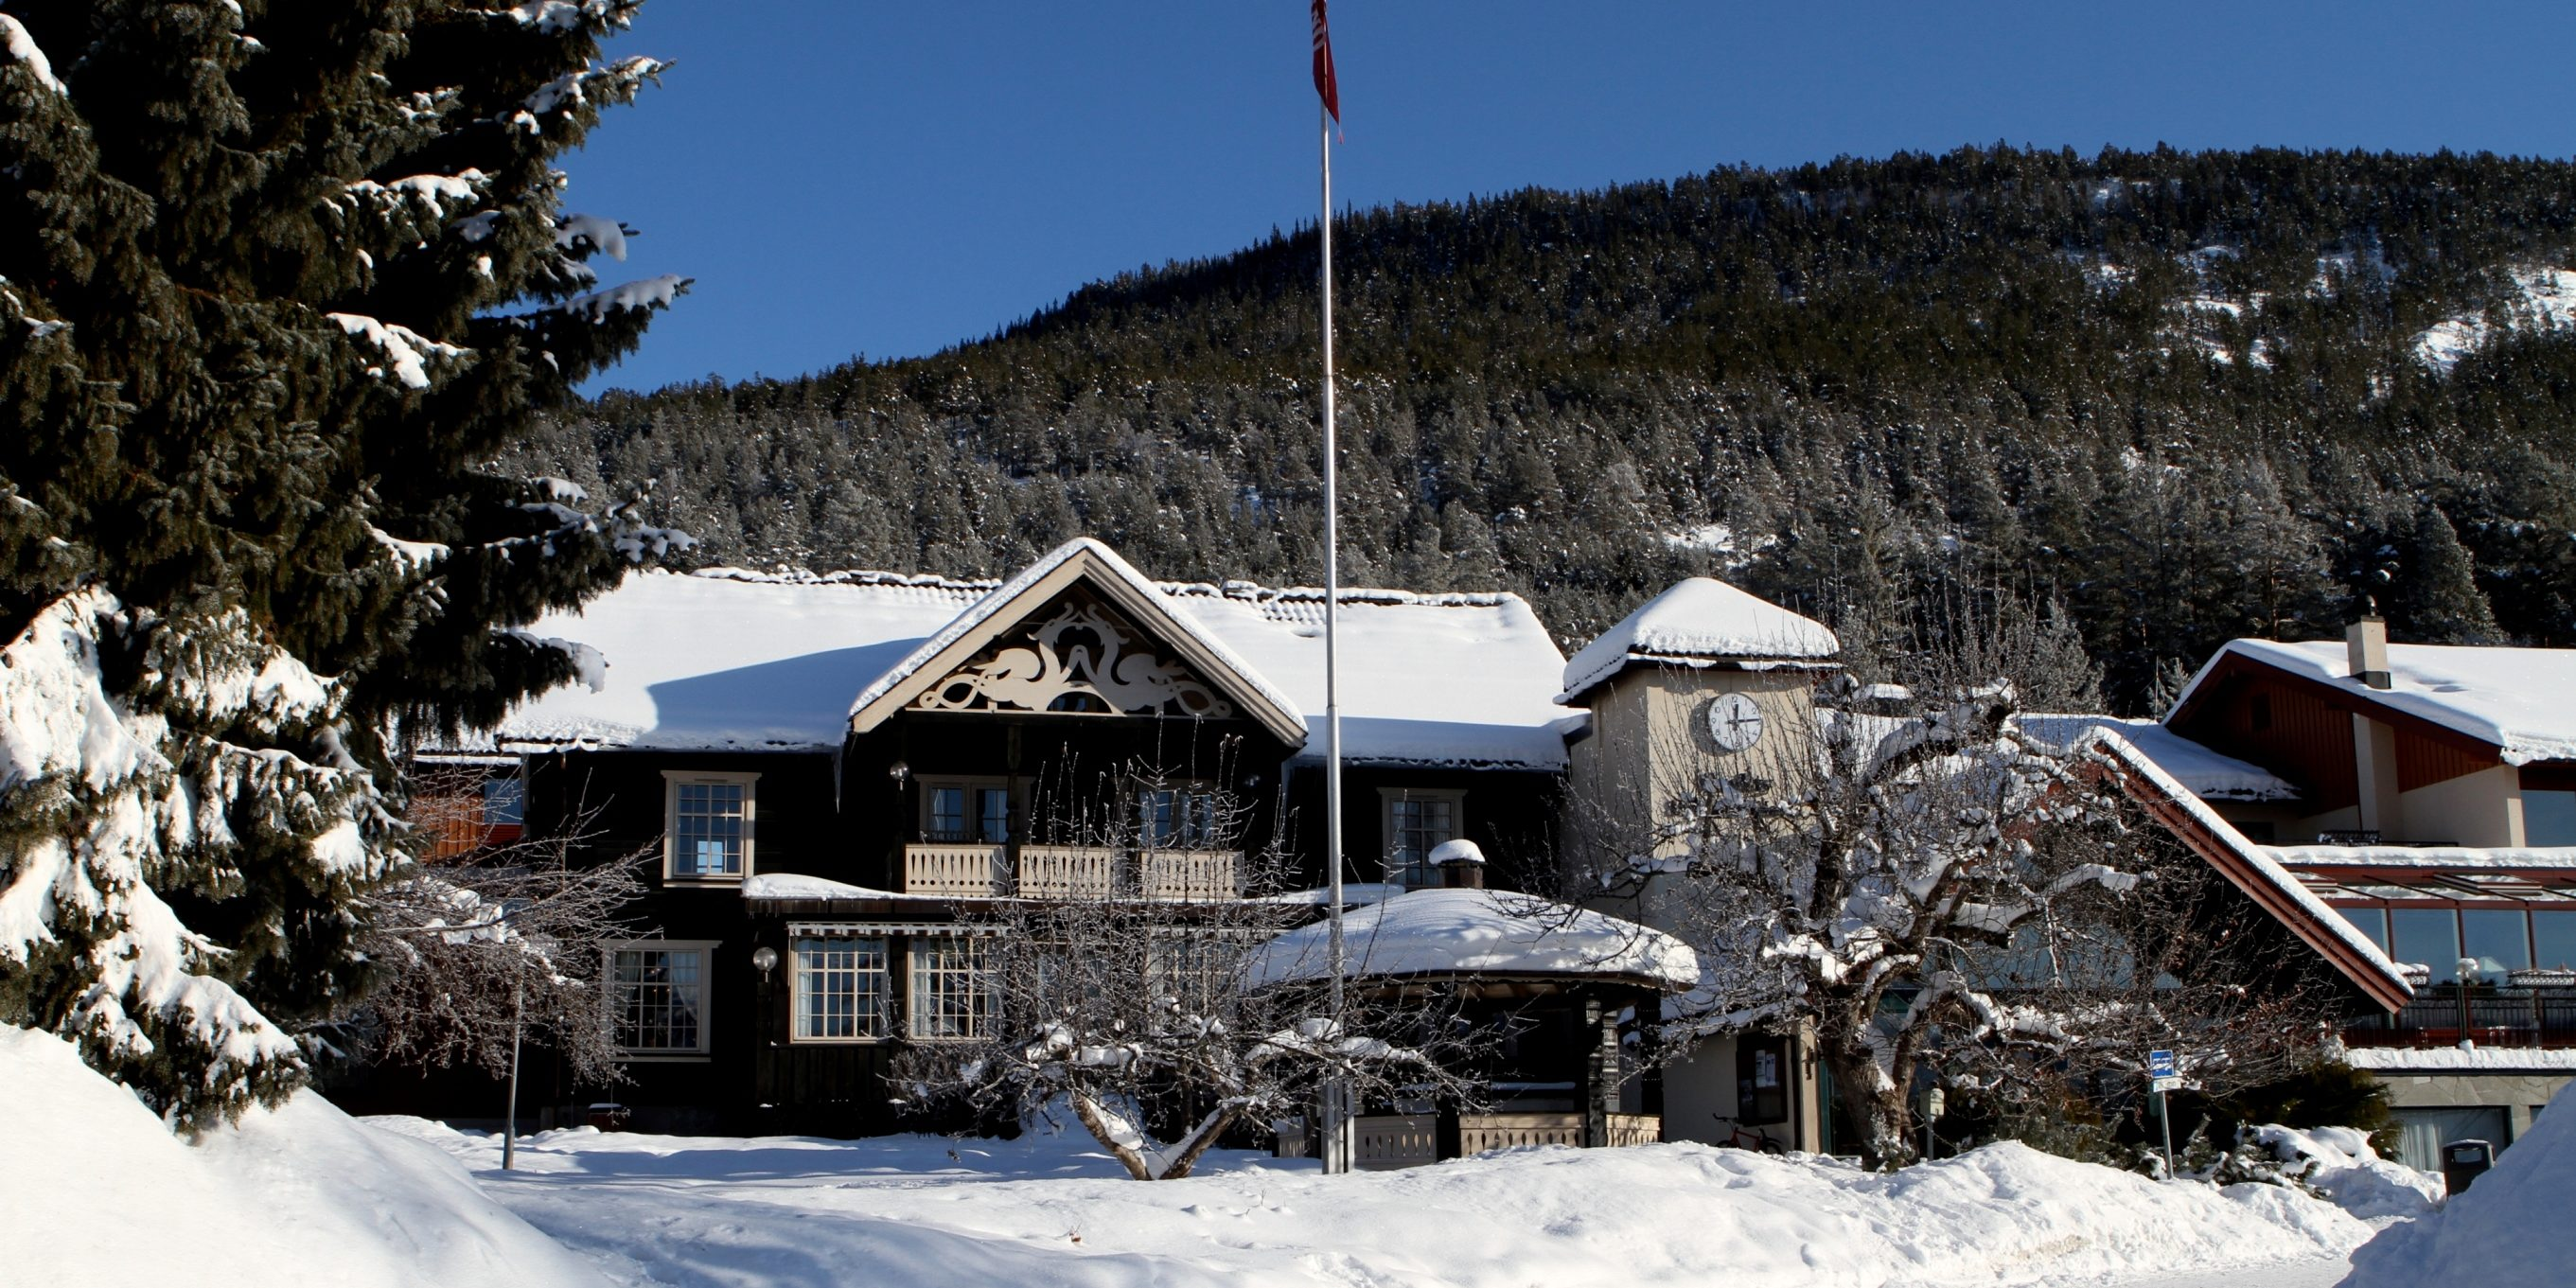 Quality Straand Hotel, Vrådal